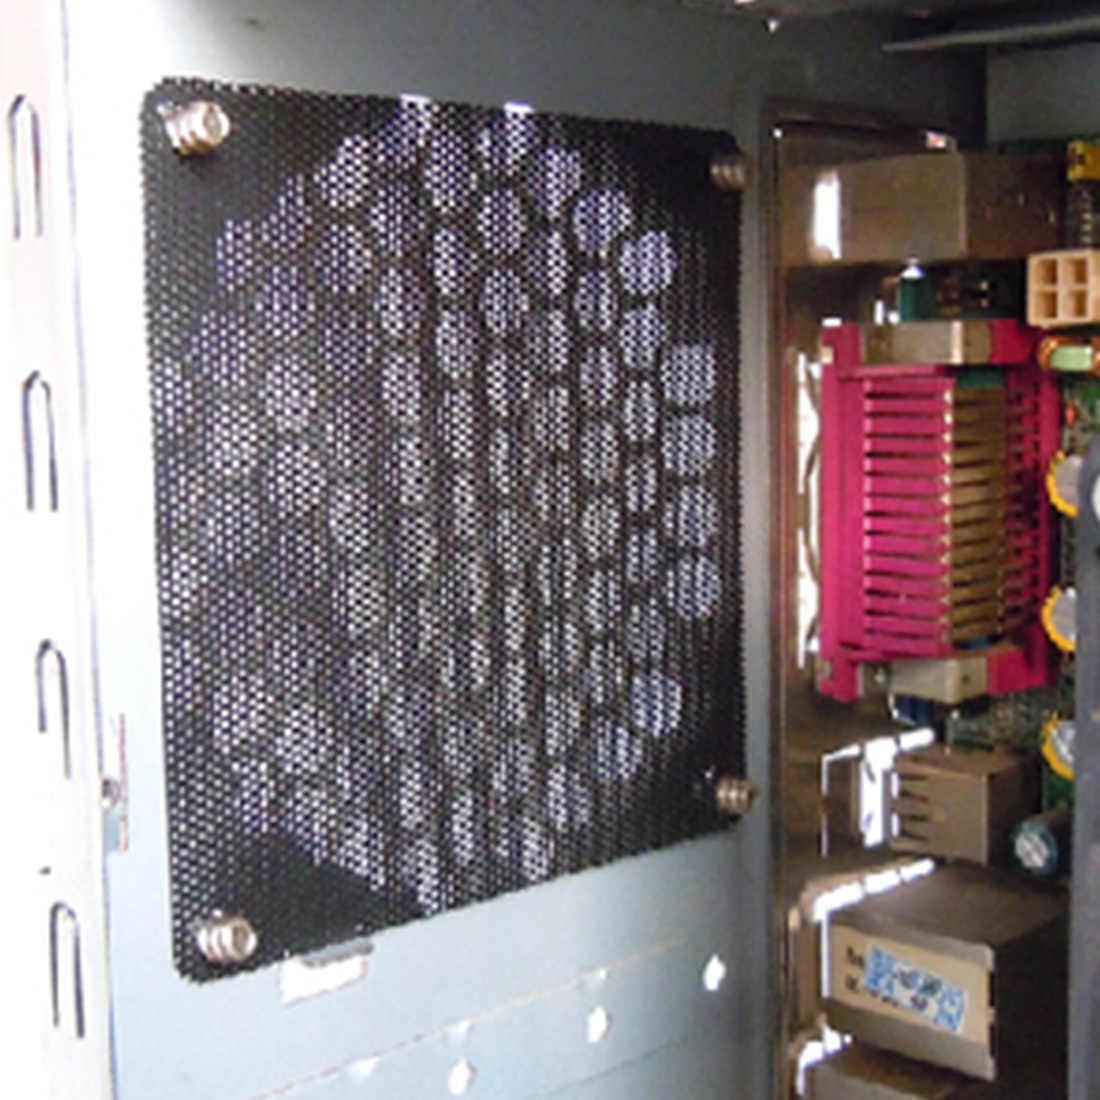 Вентилятор радиатора кулер компьютер Вентилятор охлаждения фильтр ПВХ 120 мм 140 мм корпус вентилятора Пылезащитный фильтр Cuttable Пылезащитная сетка вентиляторы